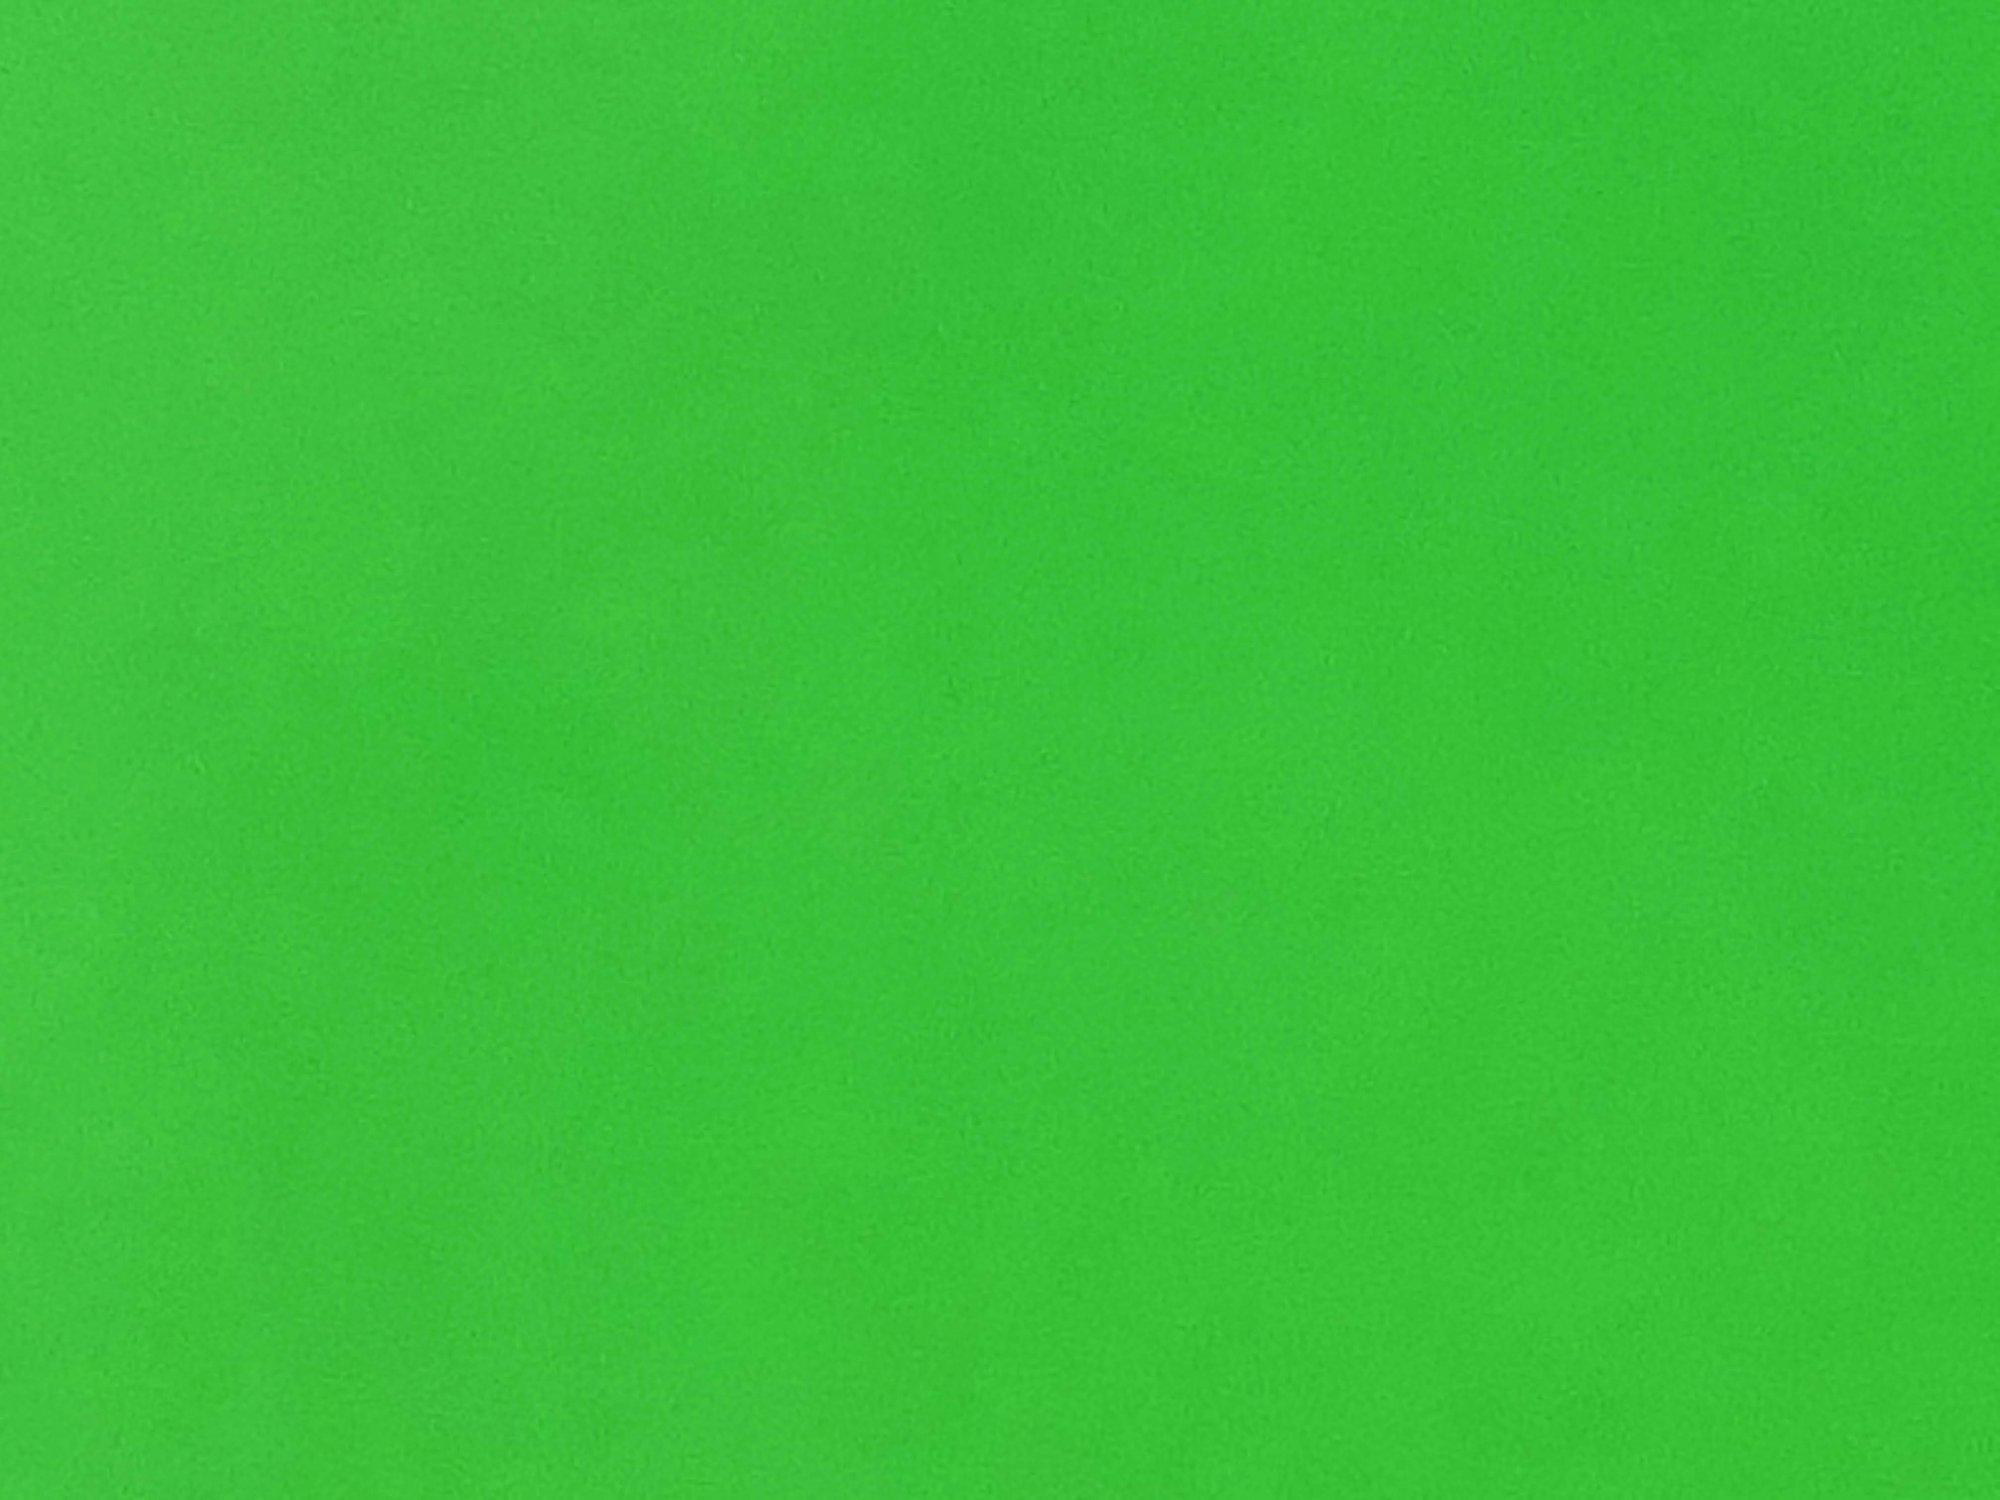 Stahls' Neon Green Fashion-Film Heat Transfer Vinyl 12 x 15